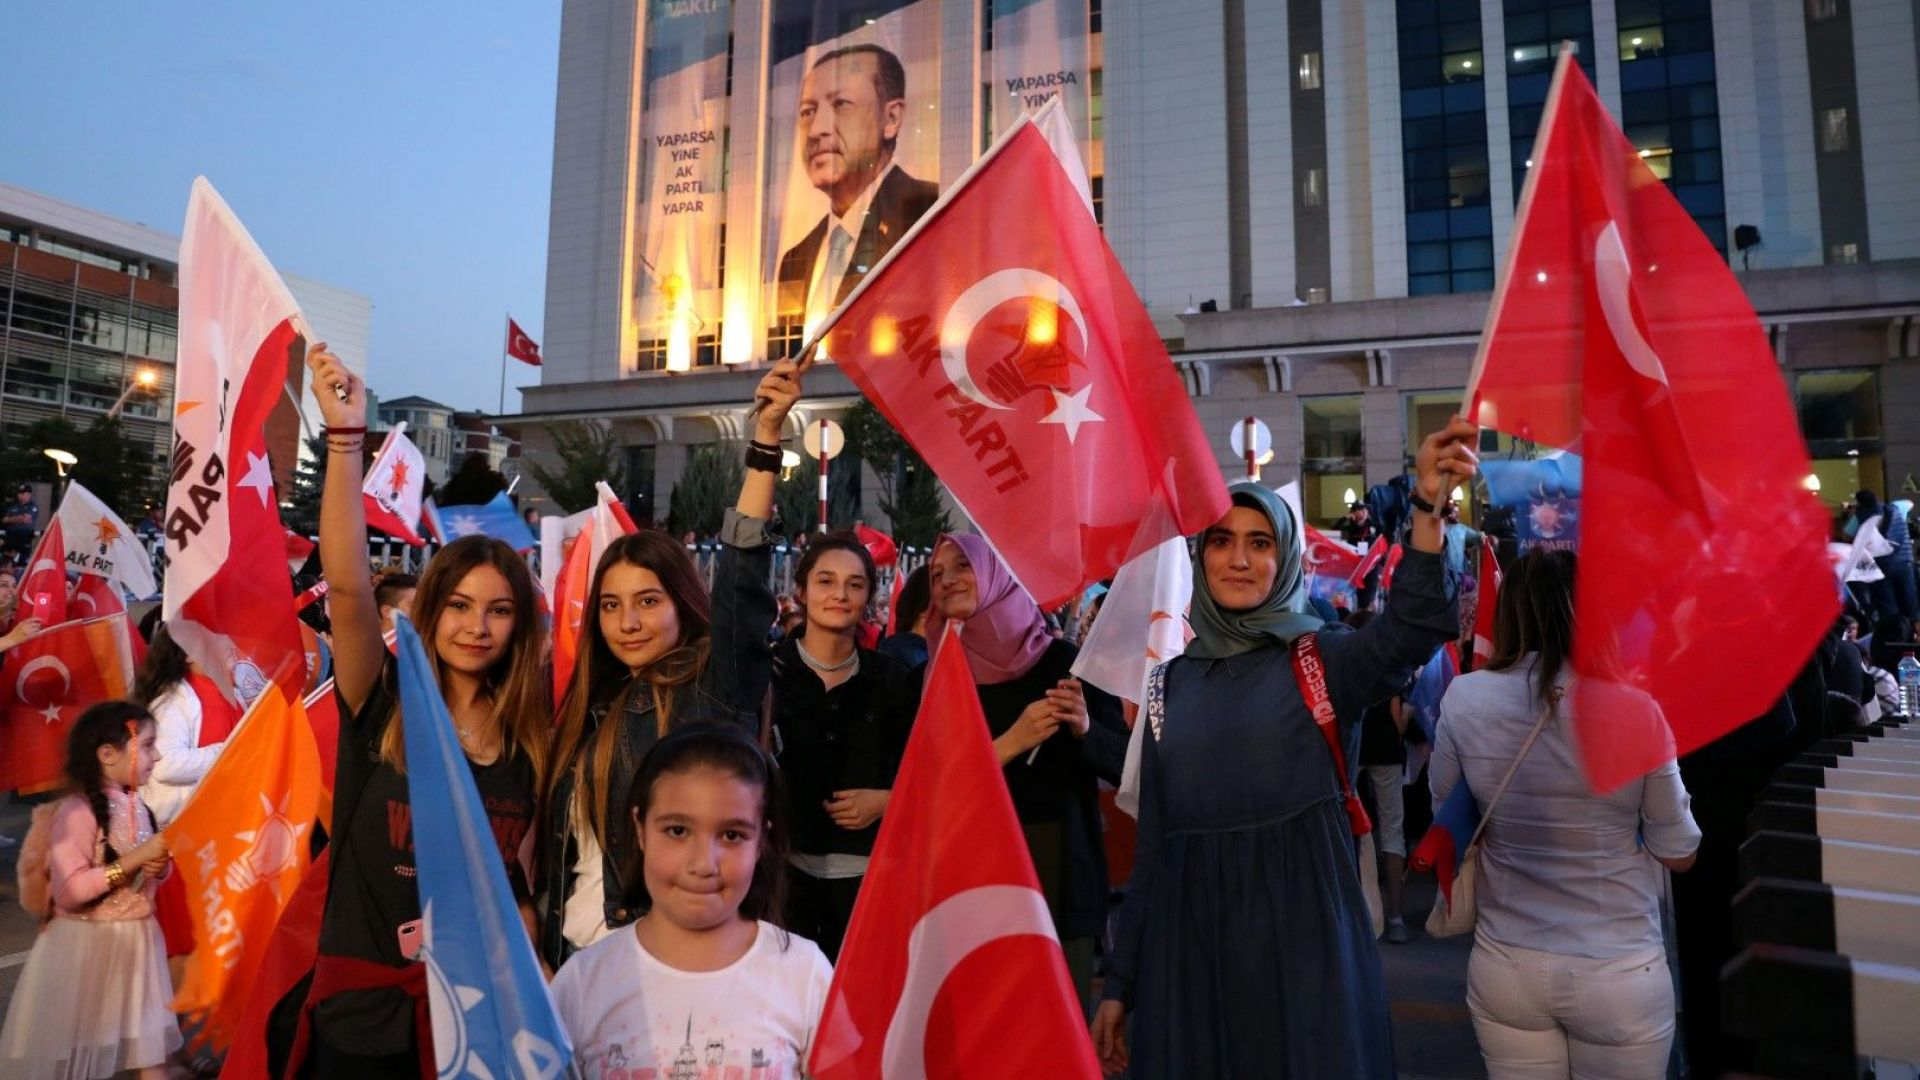 Борисов поздрави Реджеп Тайип Ердоган за изборната победа